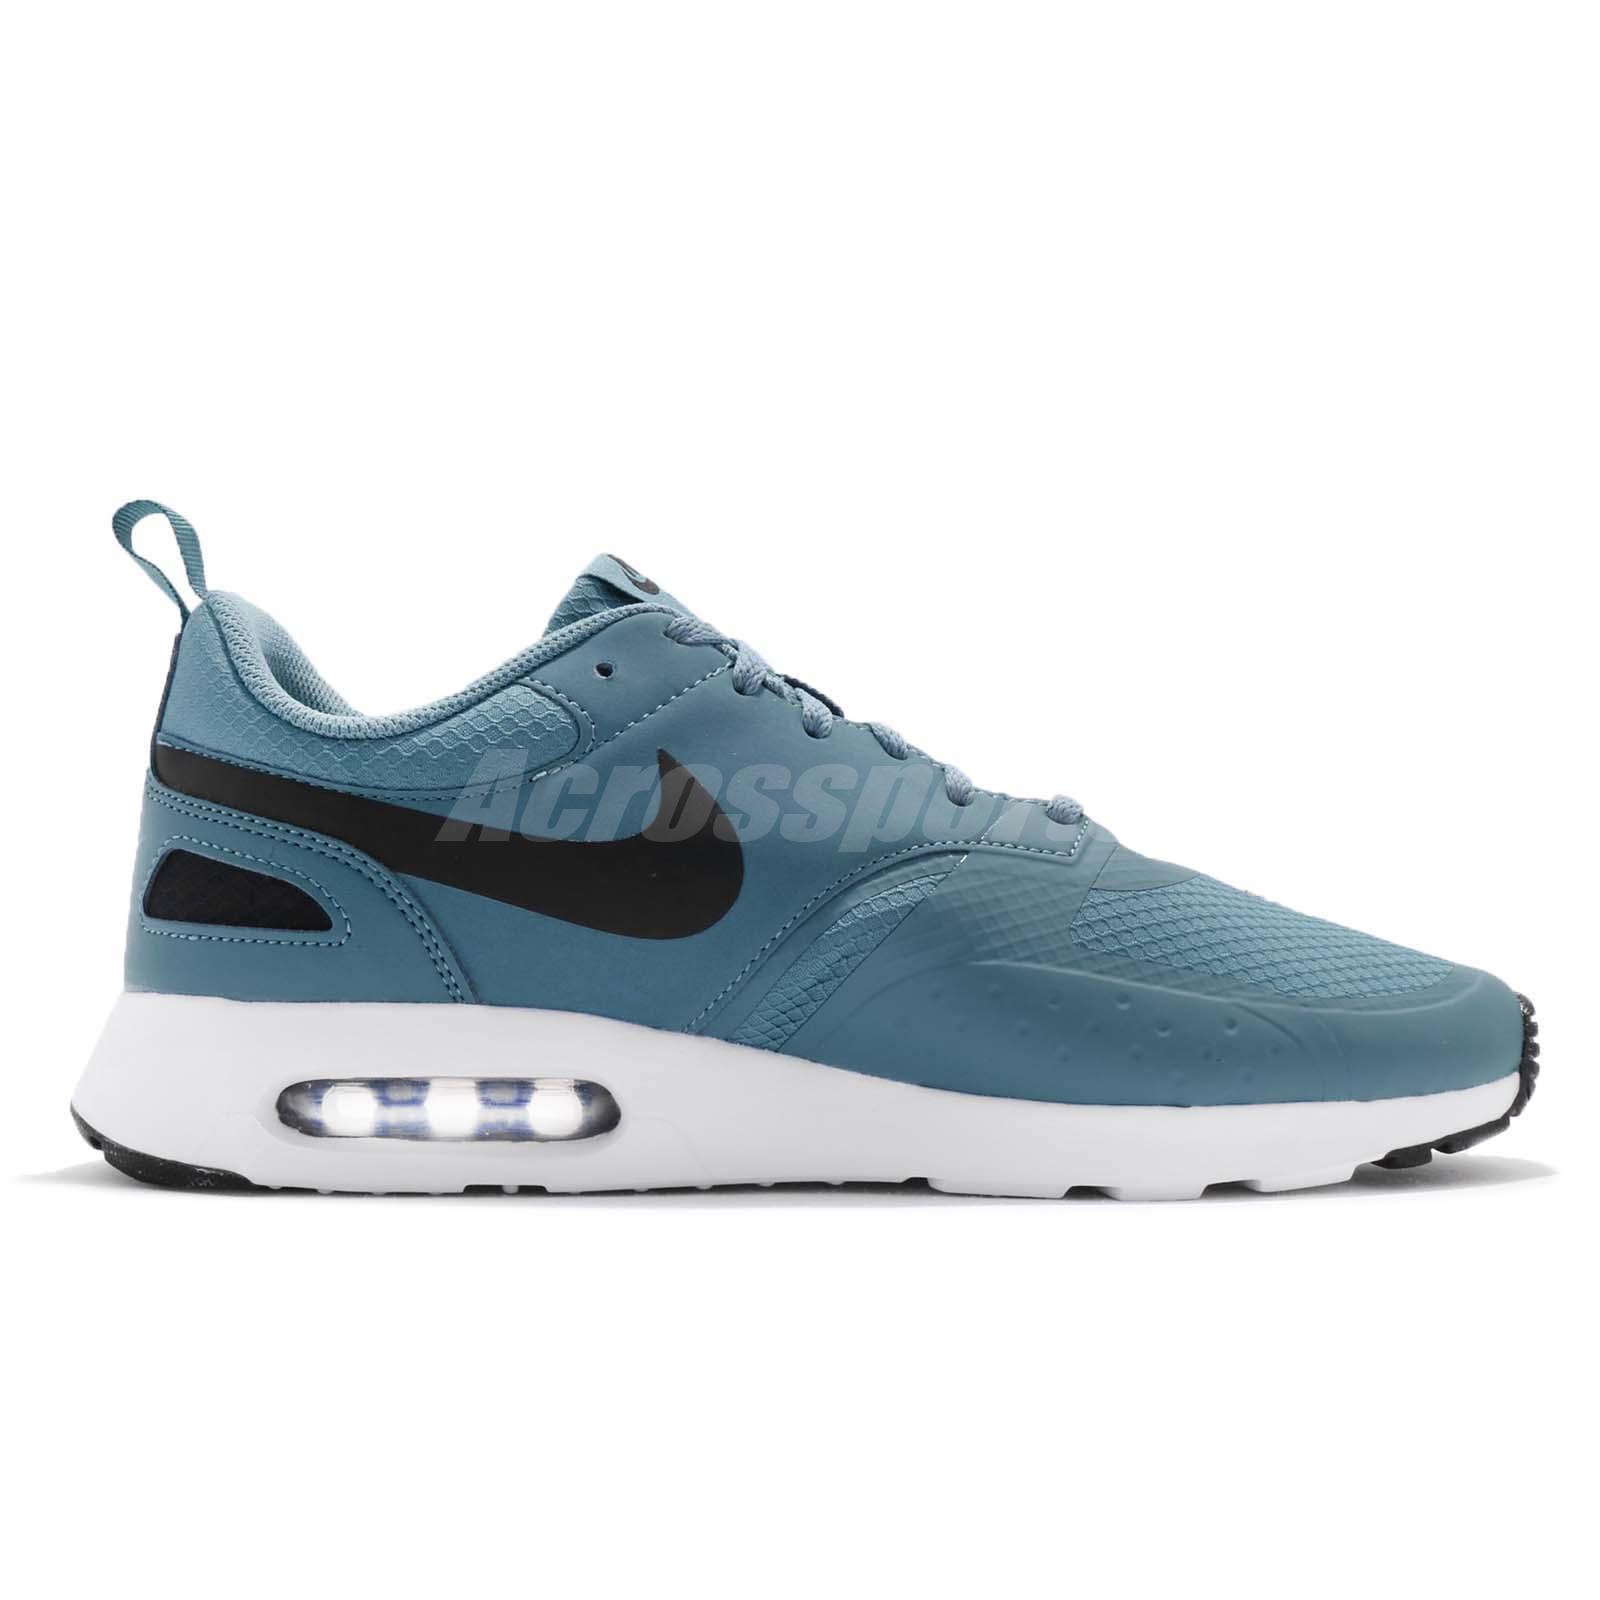 Nike Air Max Vision SE Blue Noise Aqua Black Men Running Shoes ... 1fec2e553